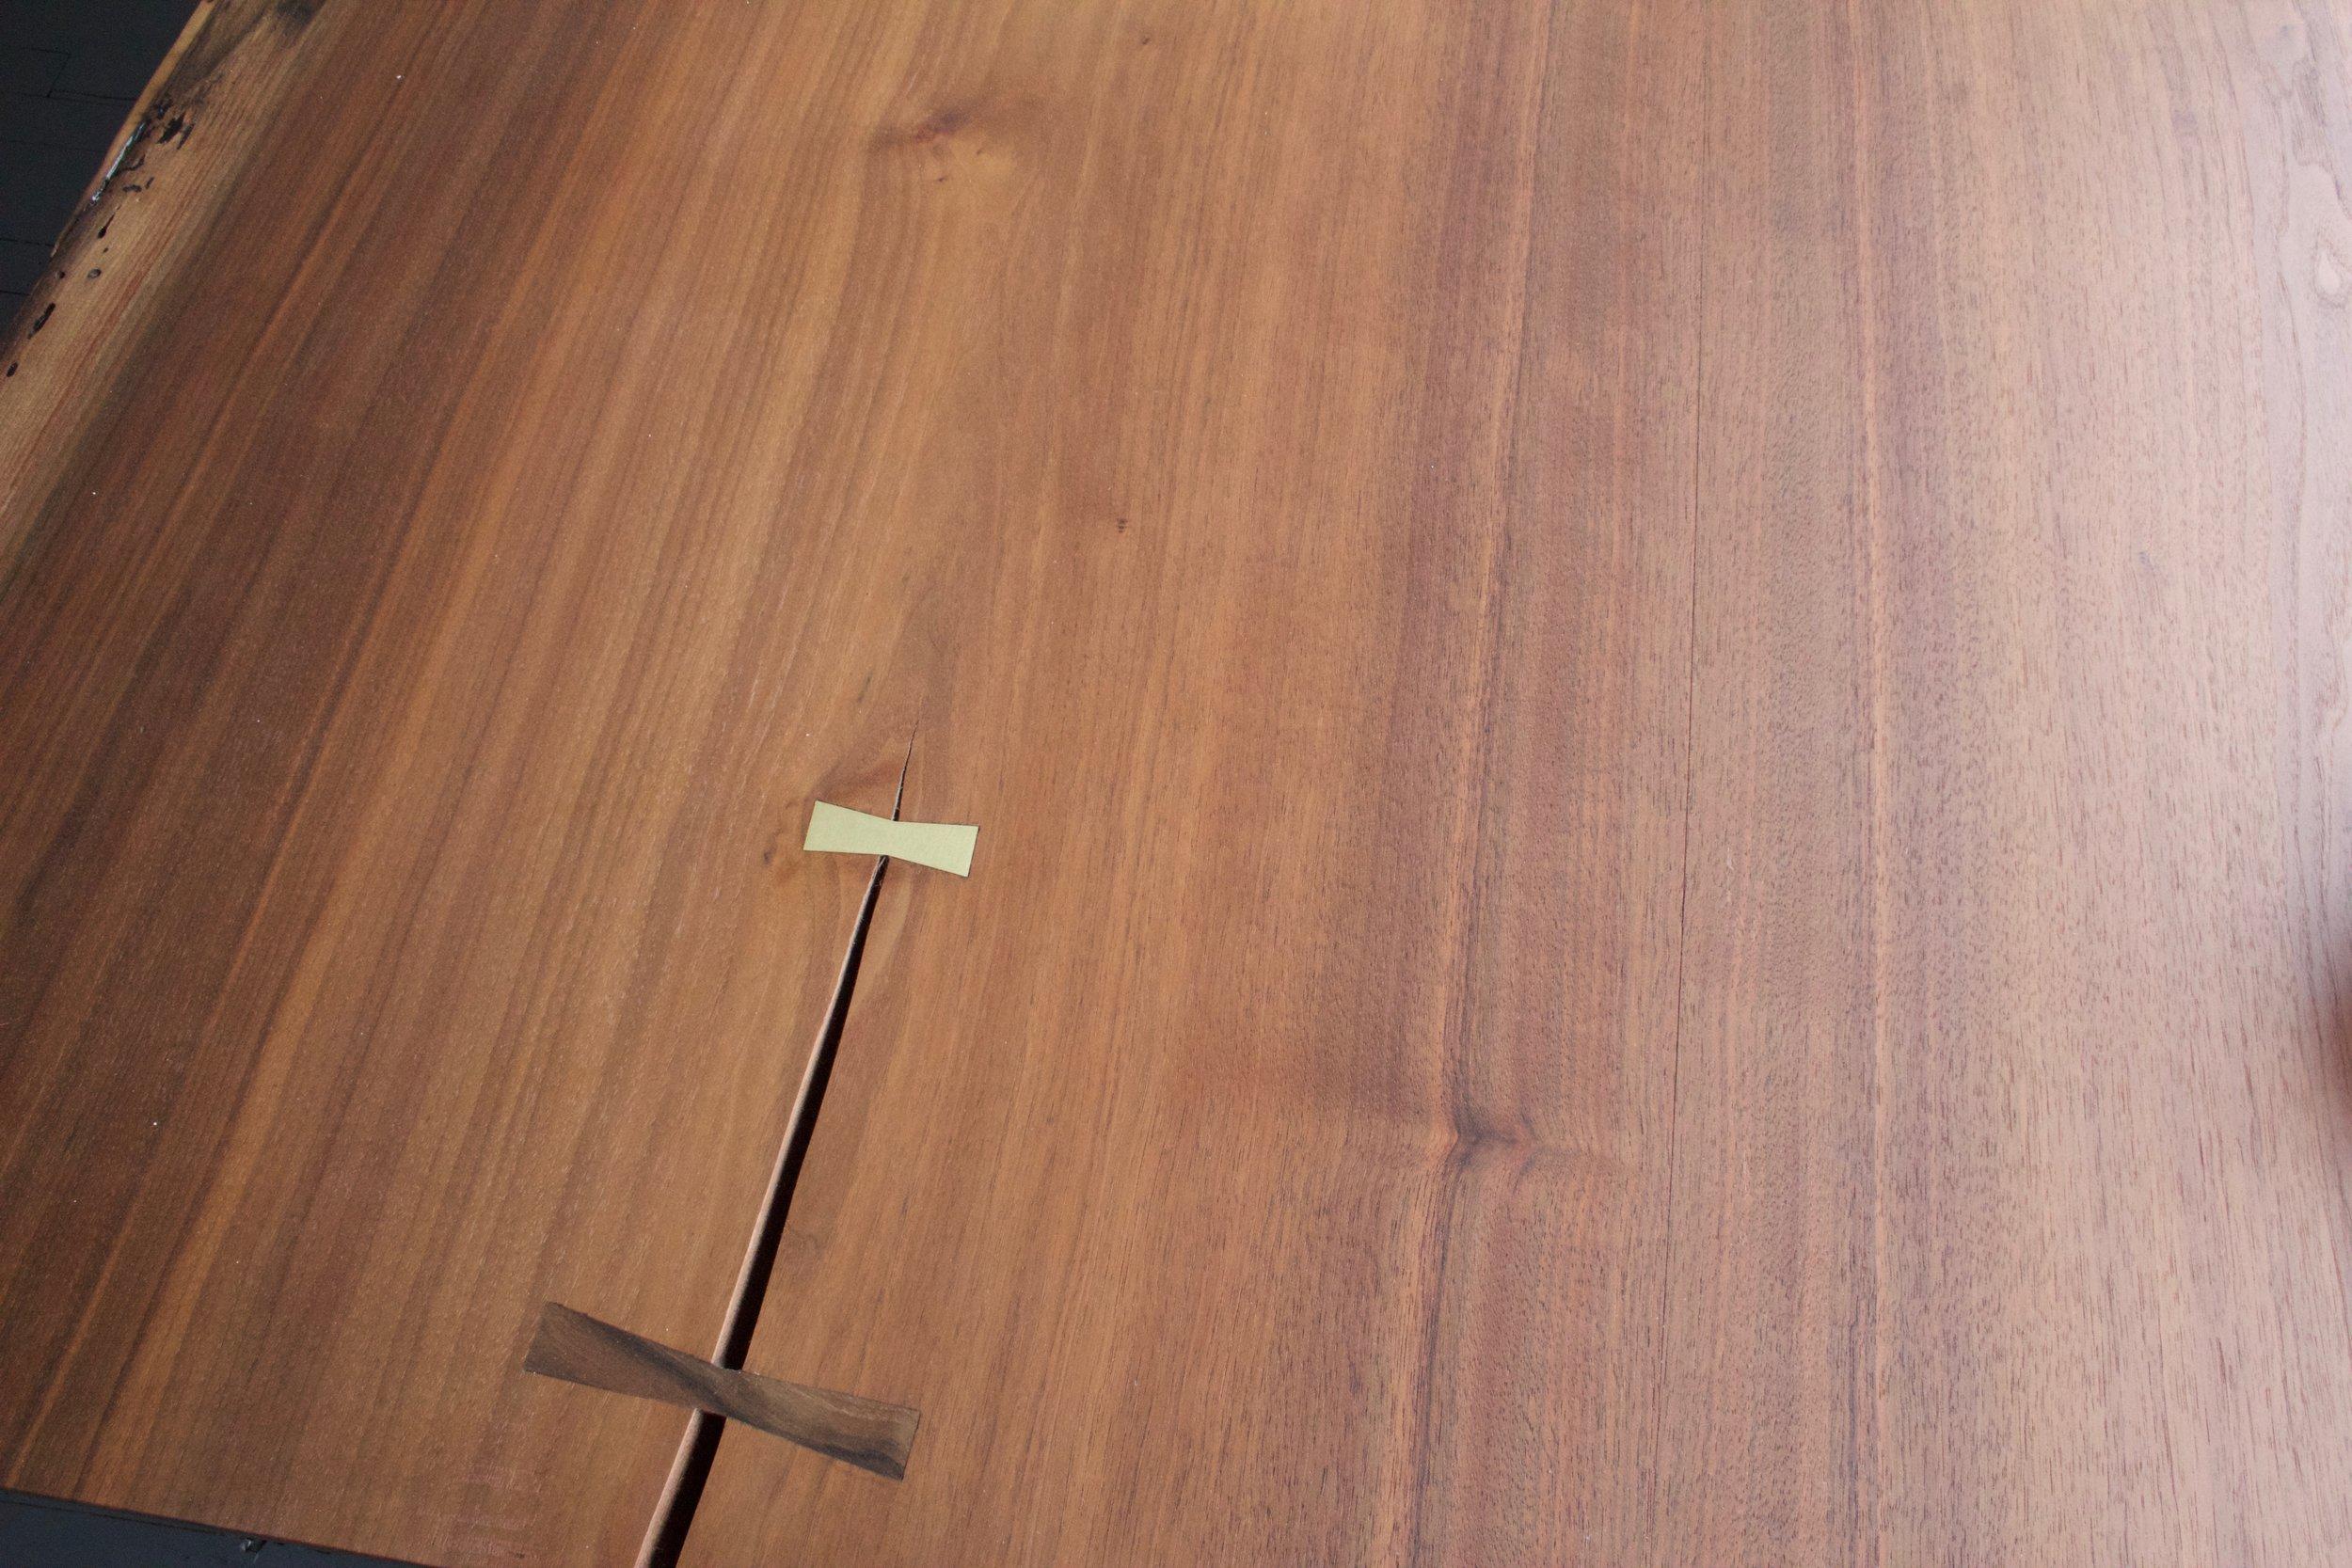 Kingston_walnut_detail.jpg